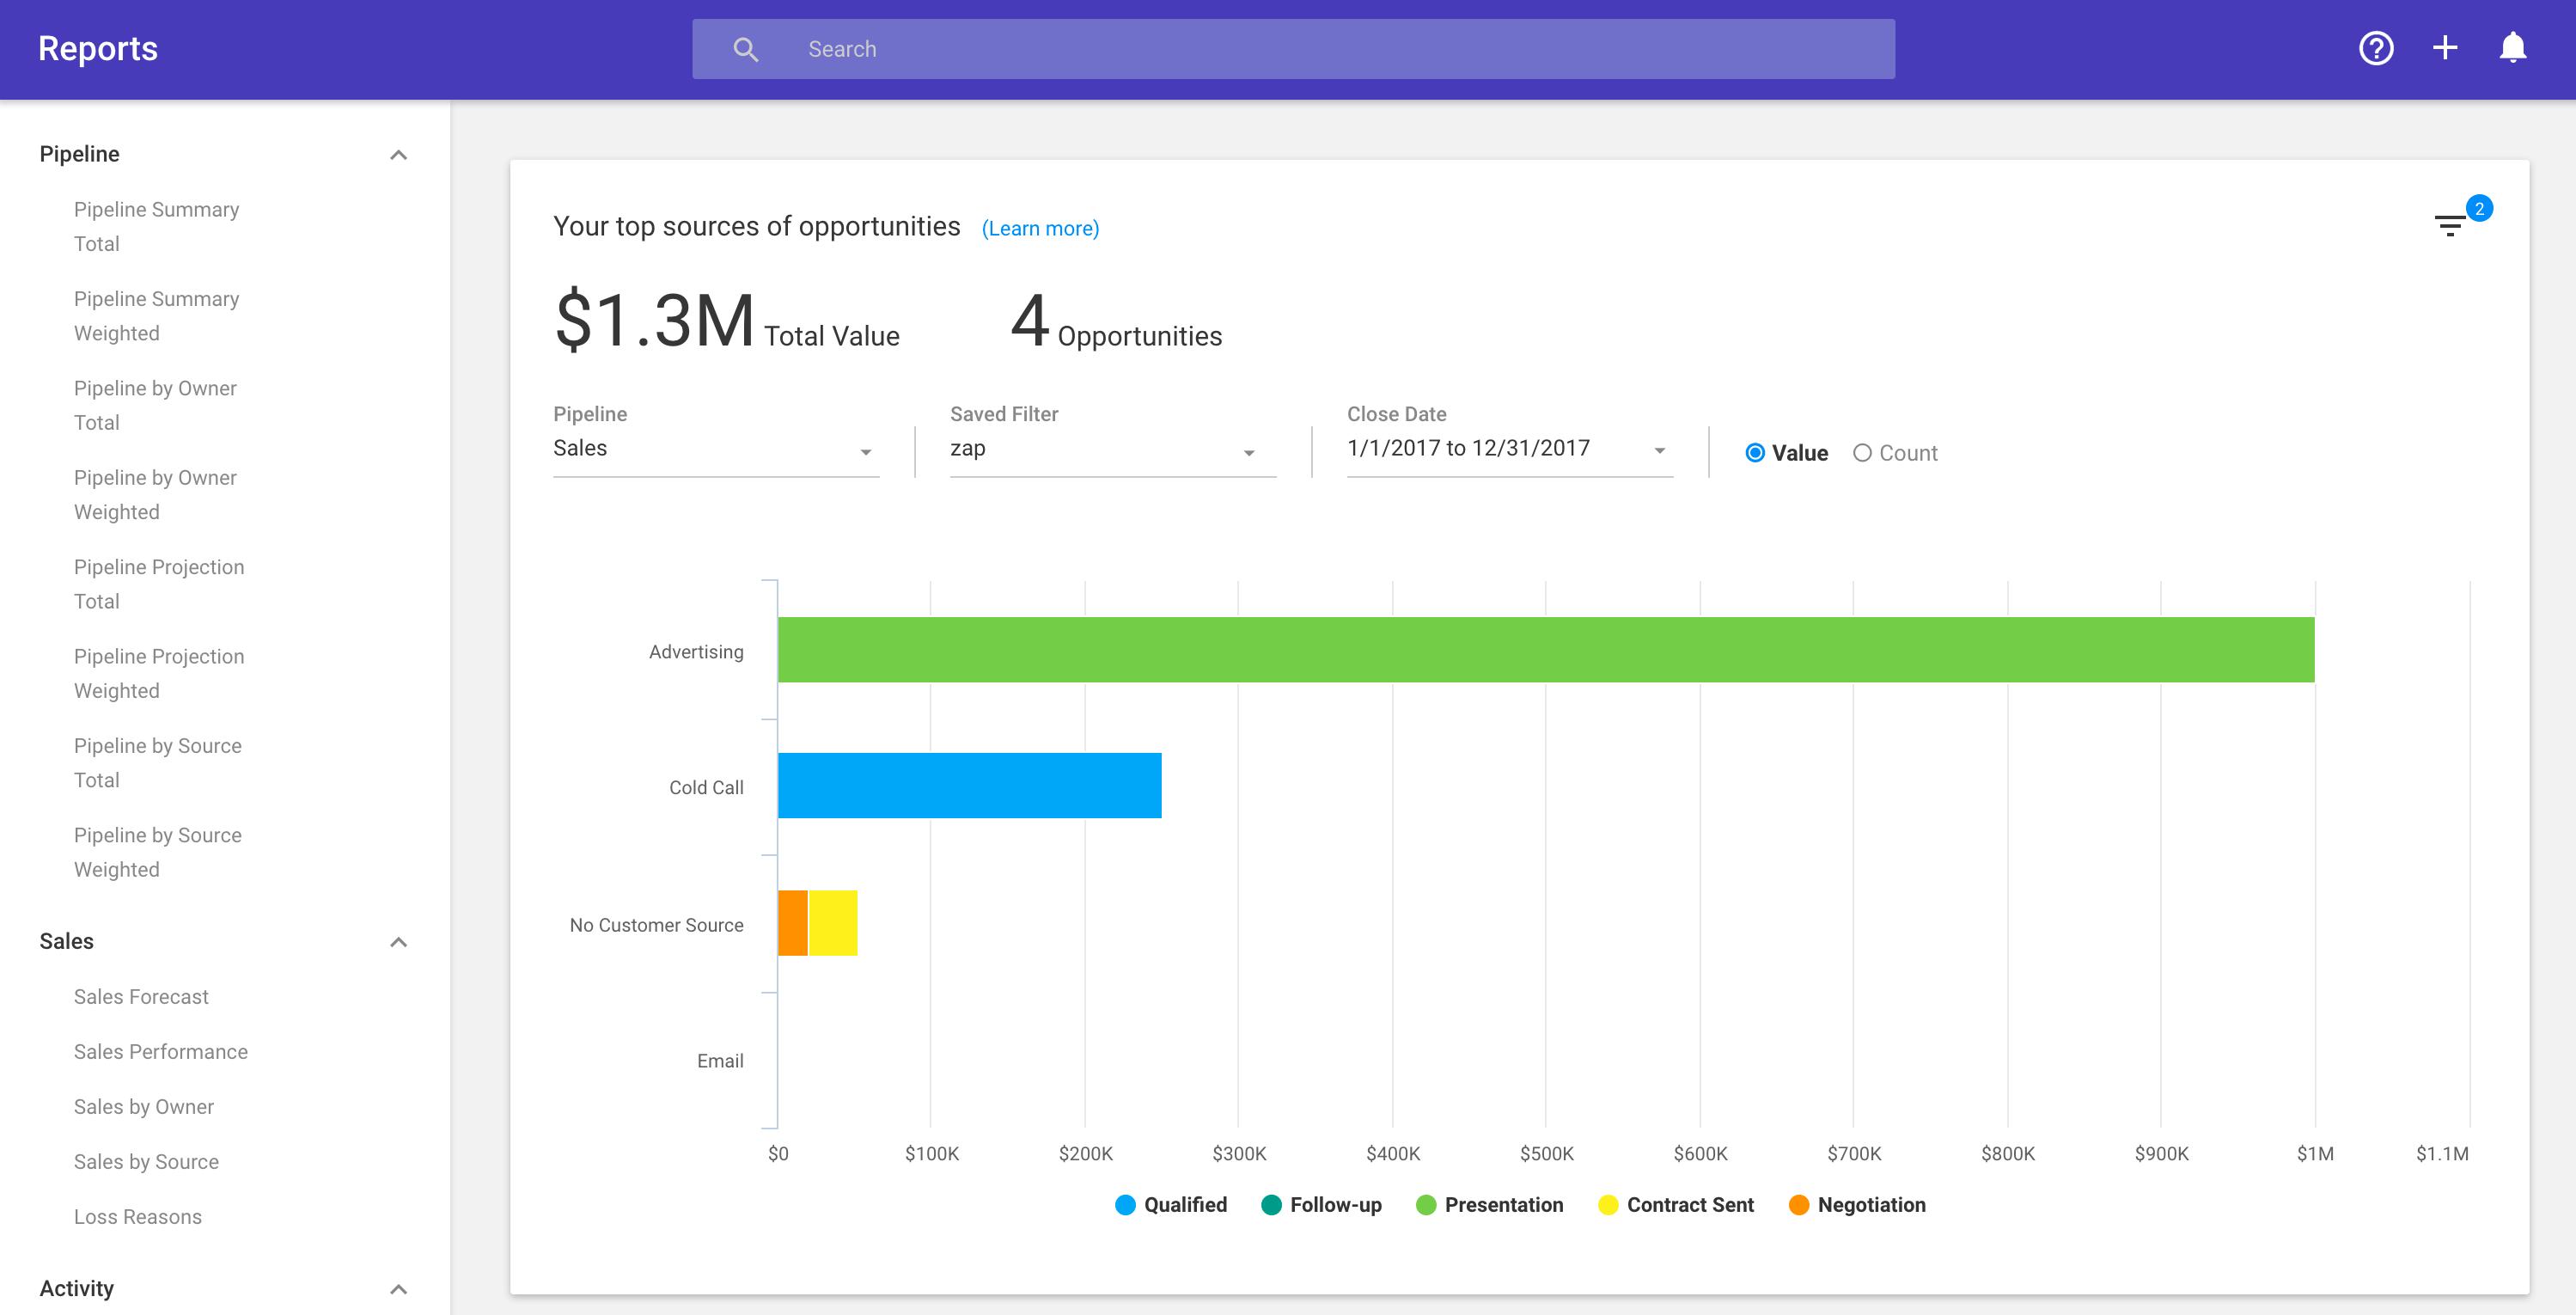 ProsperWorks Visual Pipeline Reporting